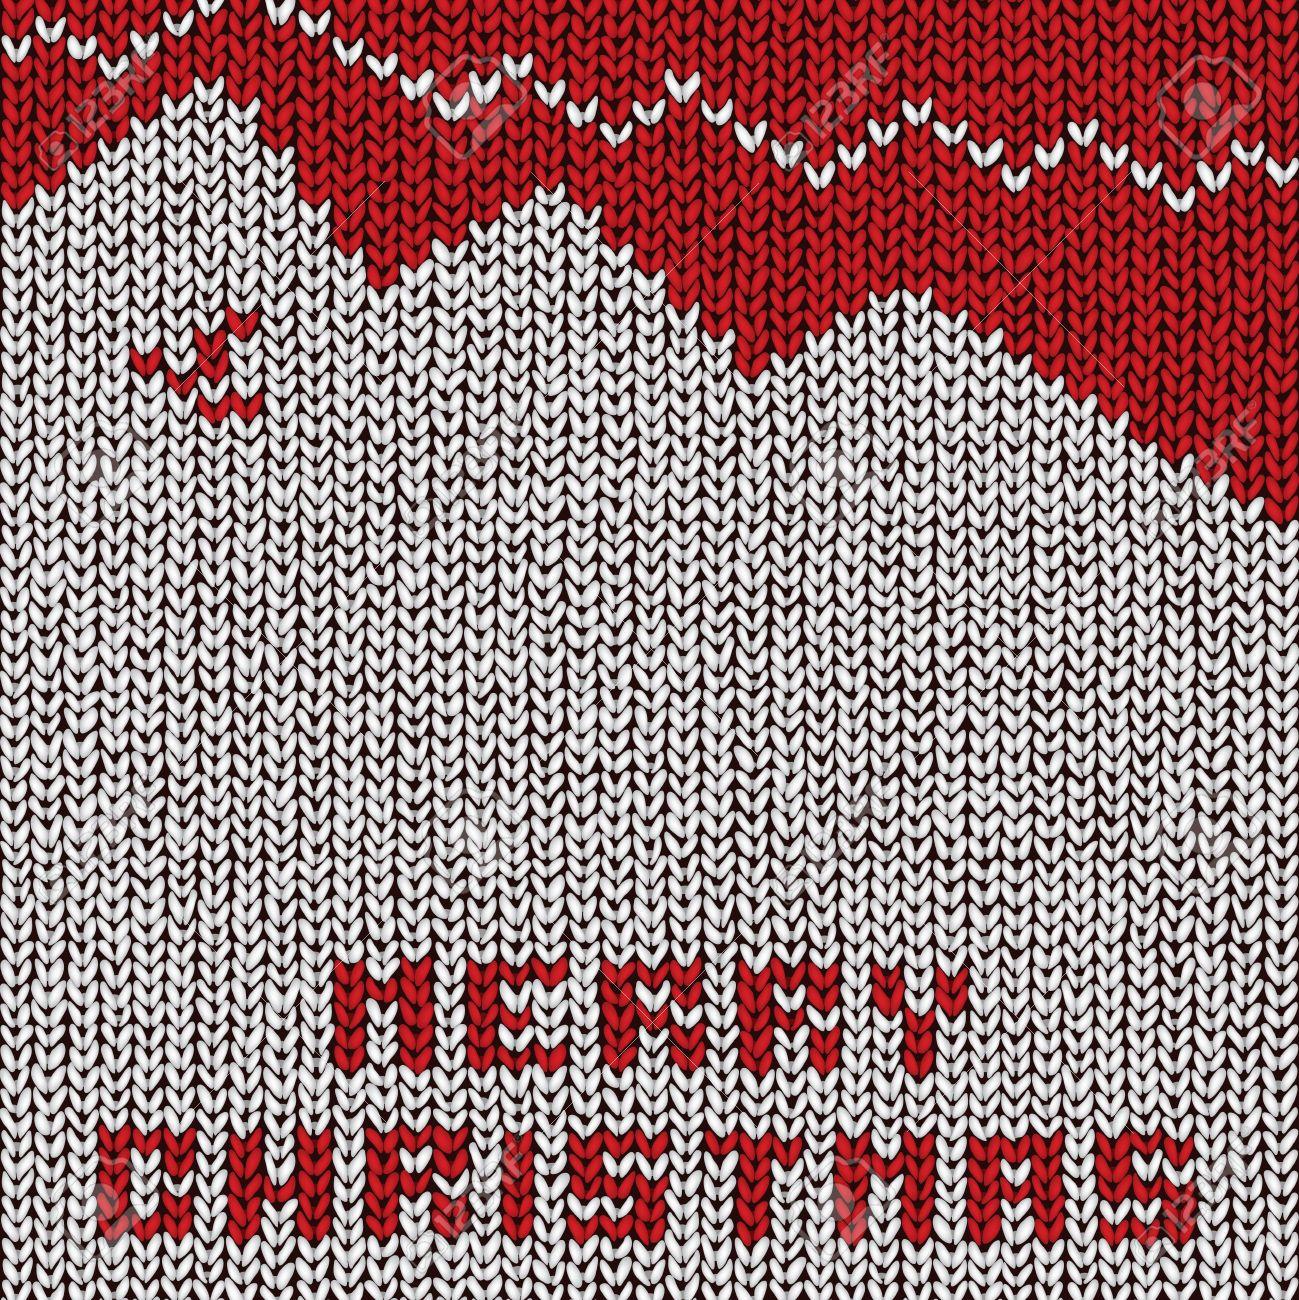 Christmas sweater background, vector eps10 illustration Stock Vector - 18278723